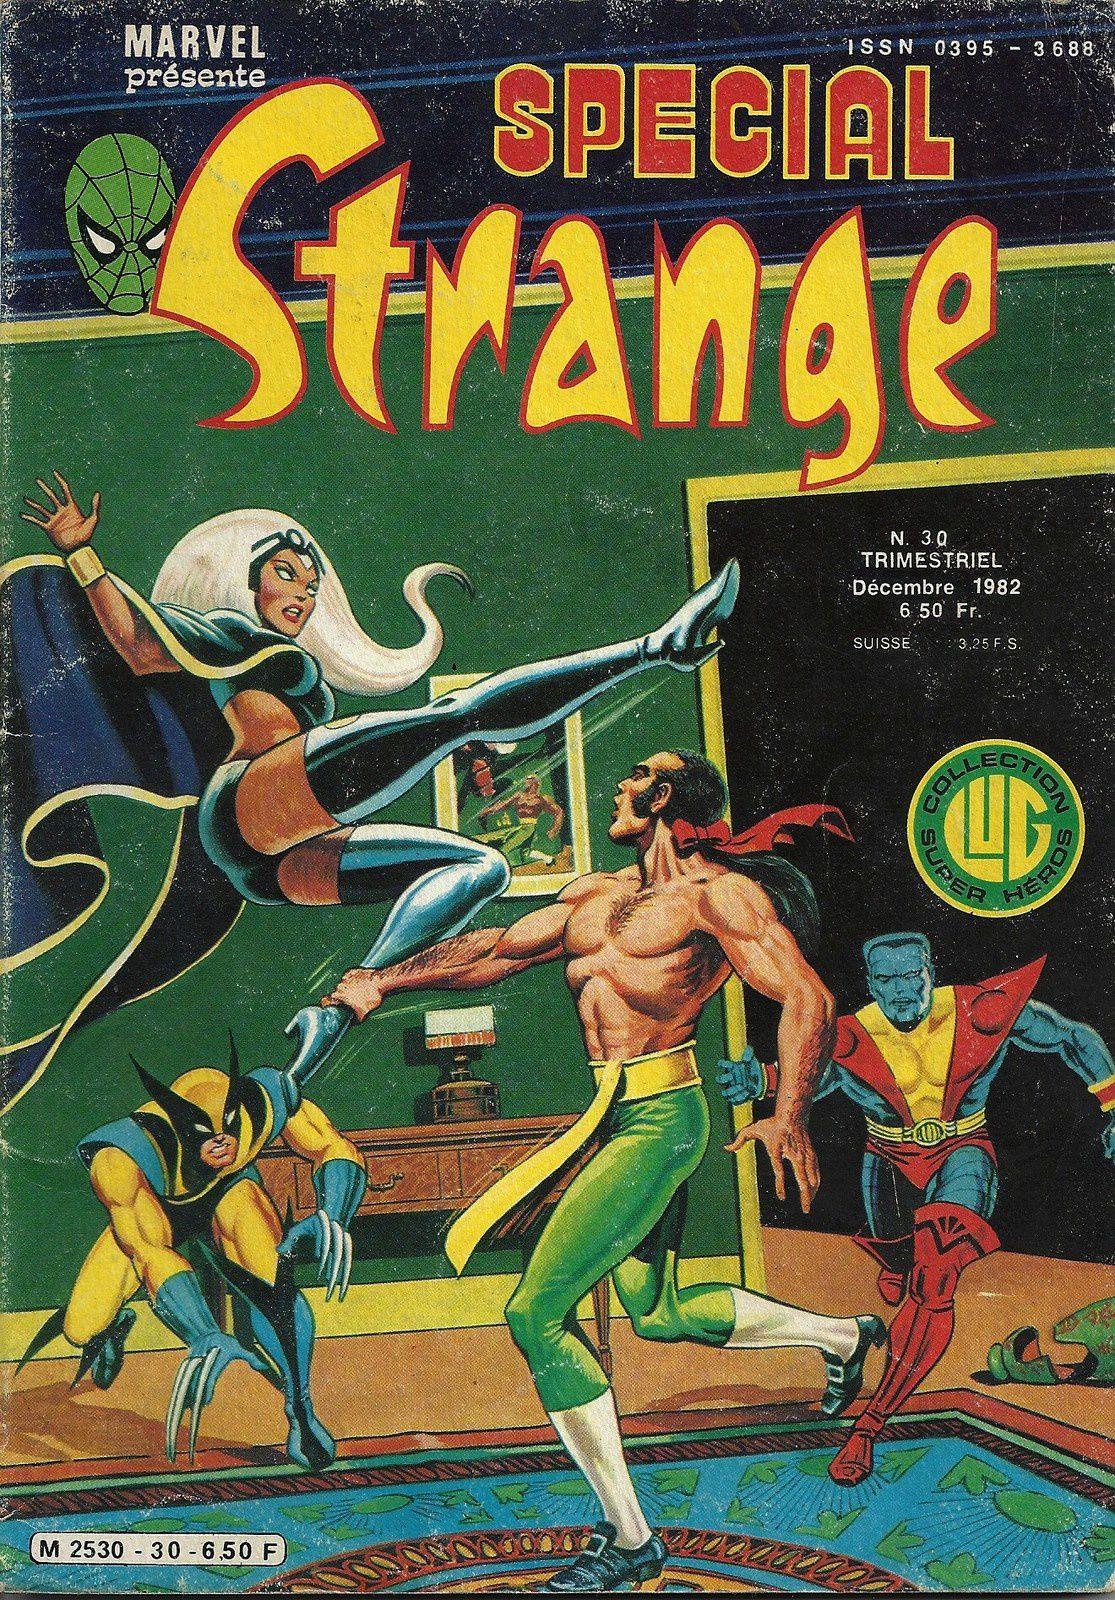 Strange,Spécial Strange, Mustang,Nova